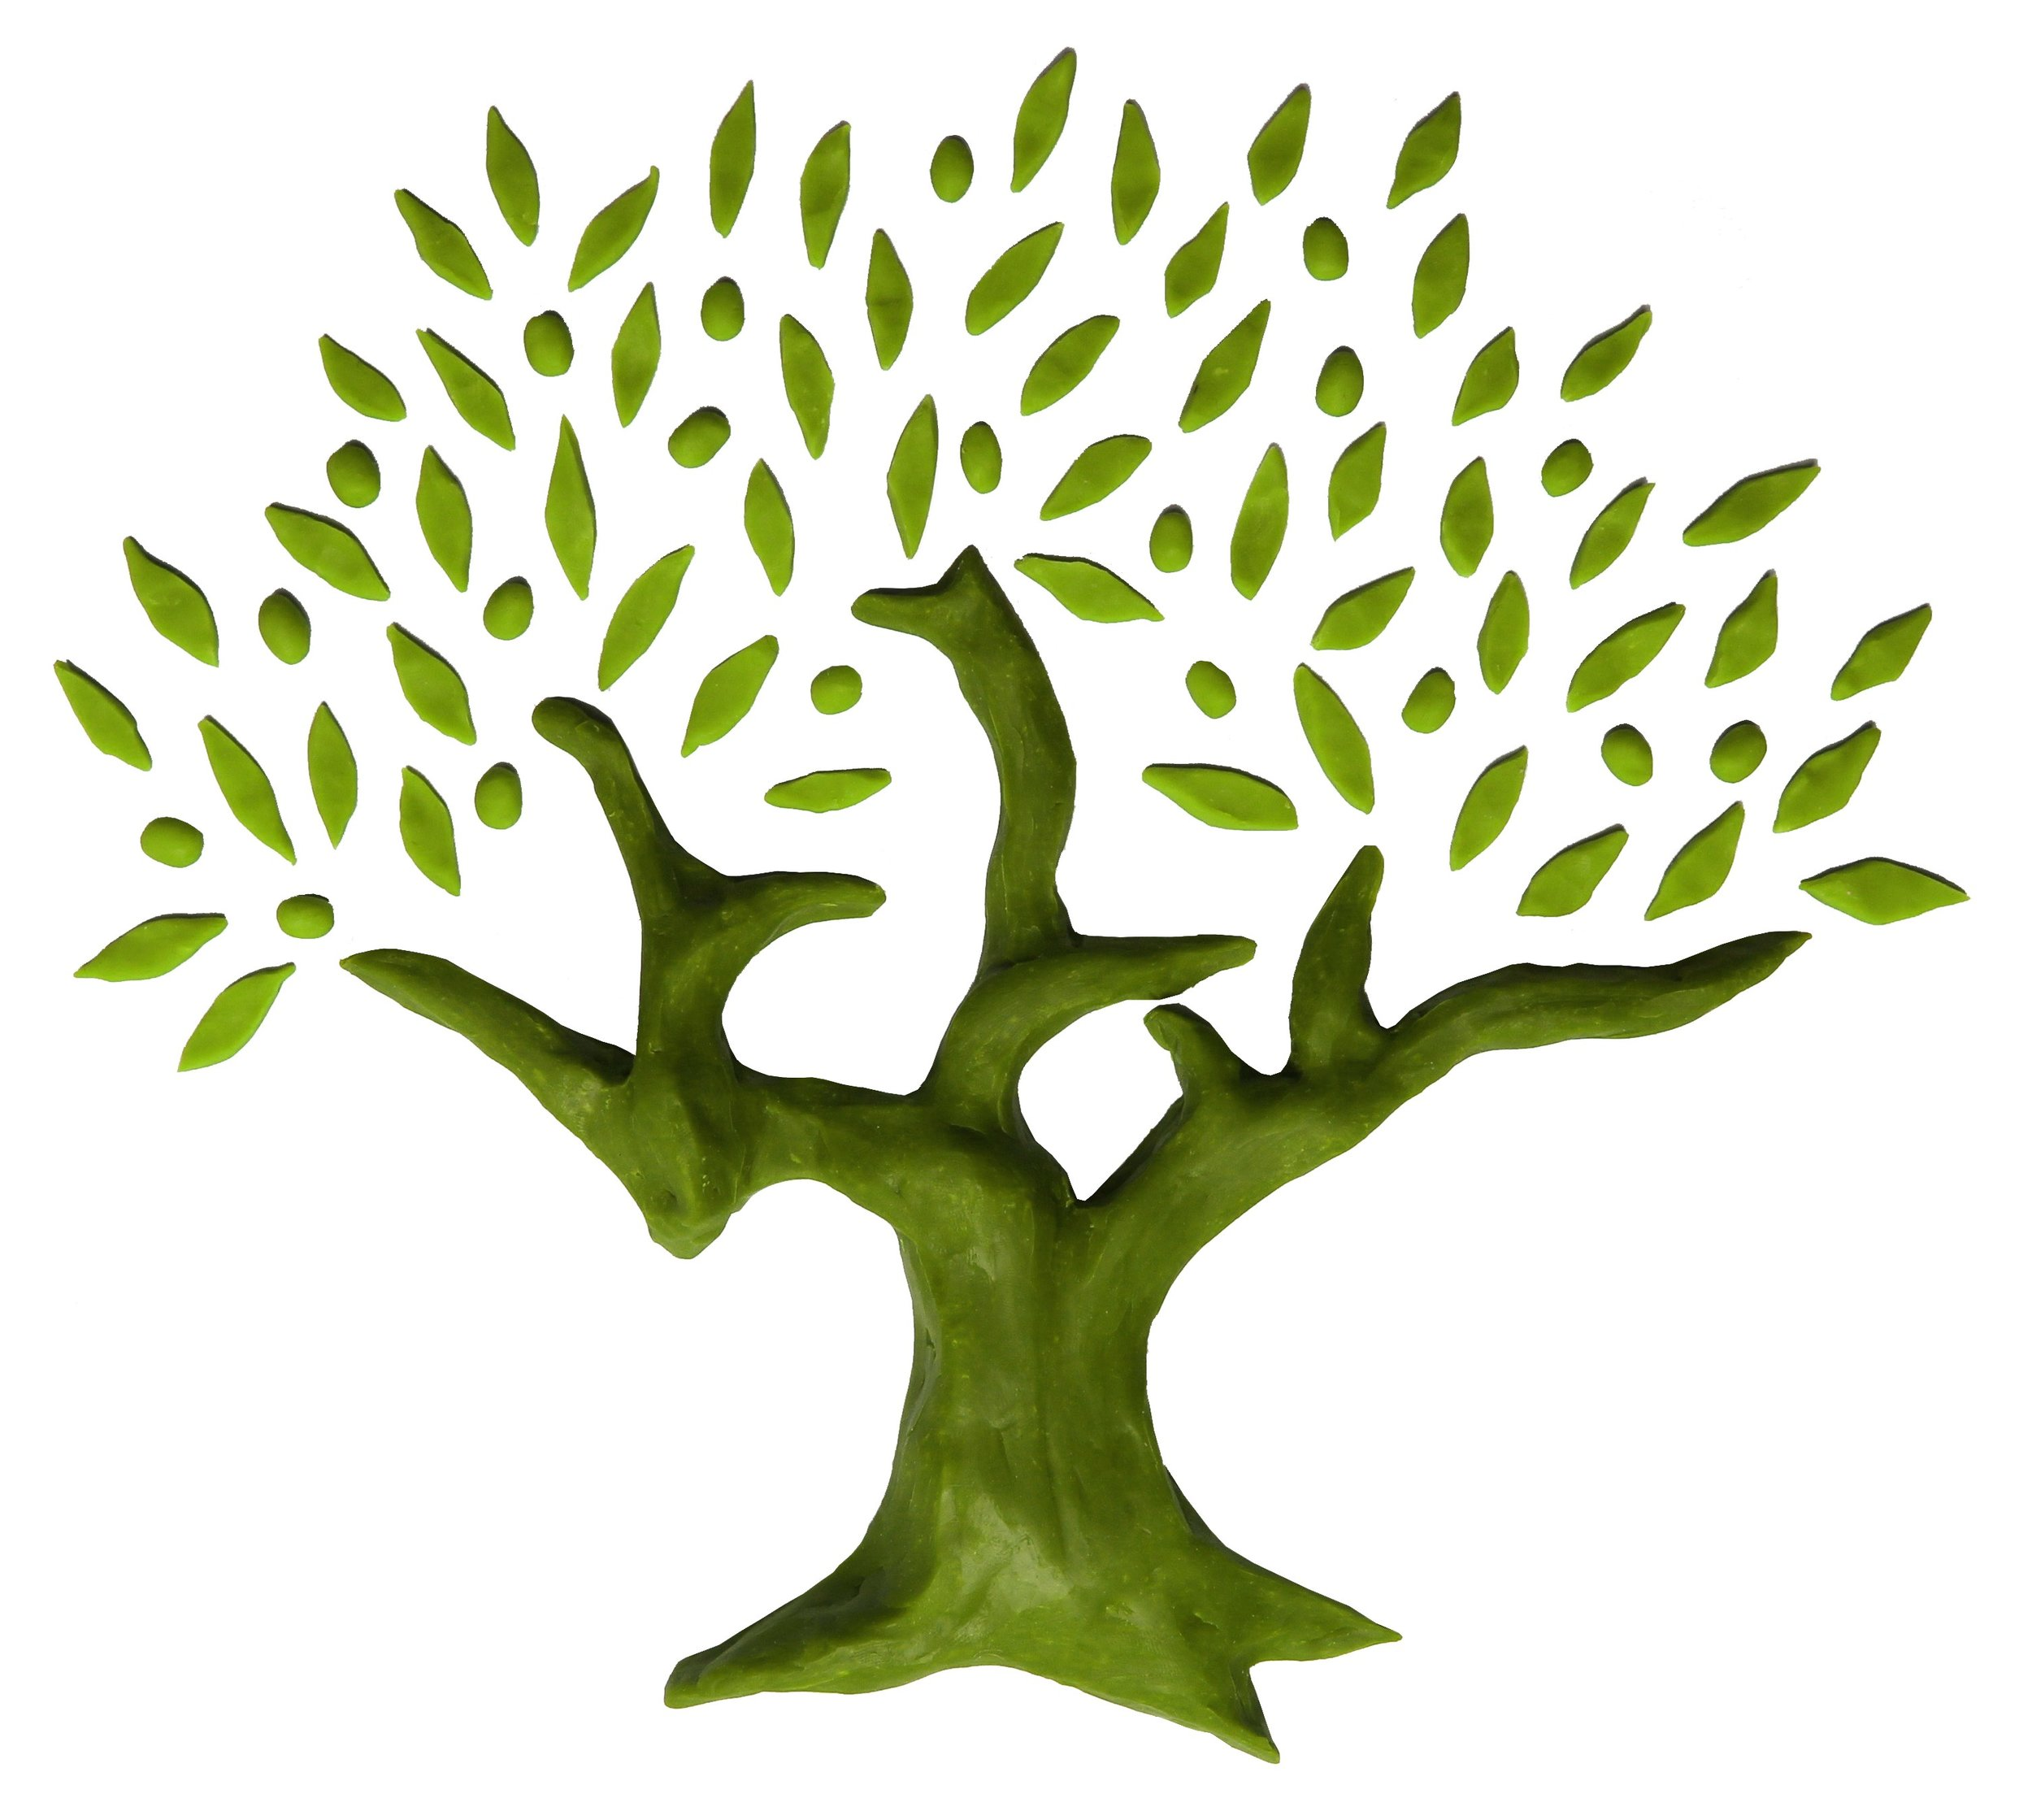 olijfboom klei groen final minder wit eromheen.jpg